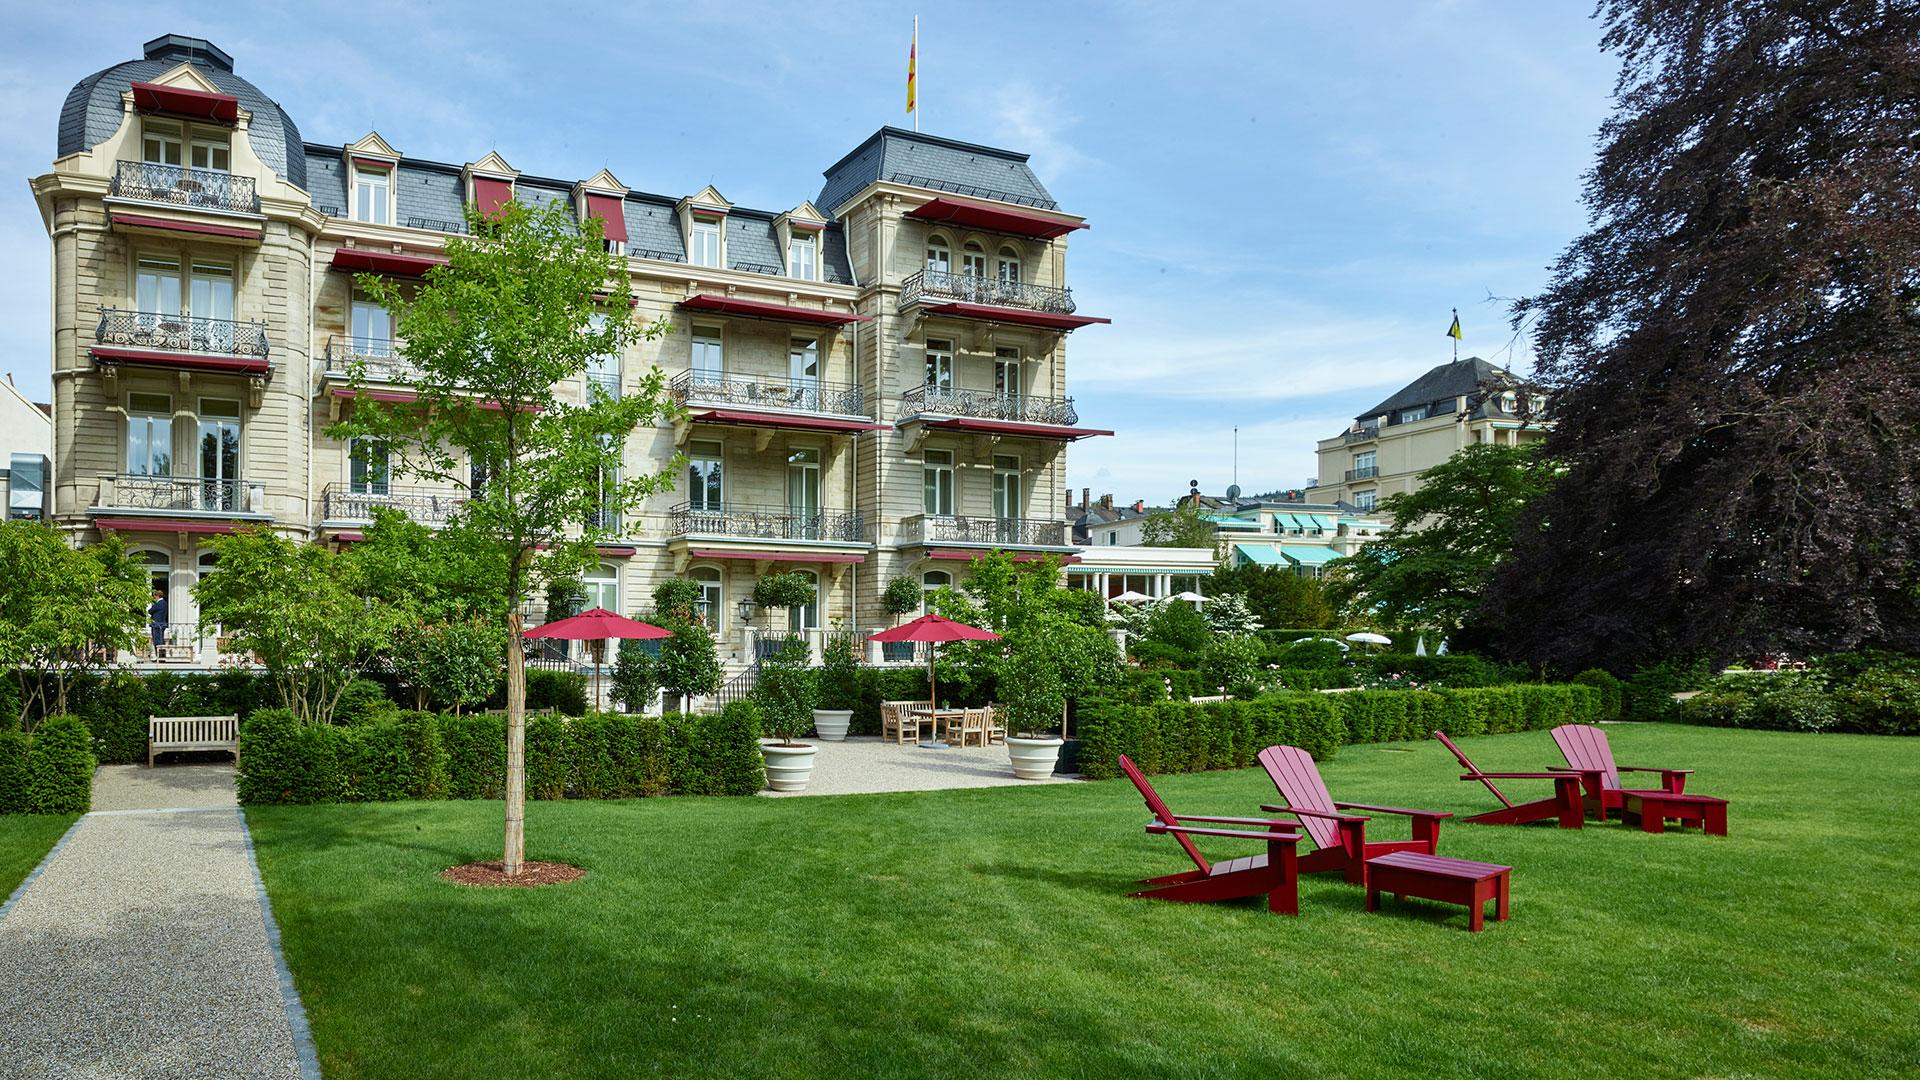 Villa stephanie spa medical care in baden baden for Villas steffany